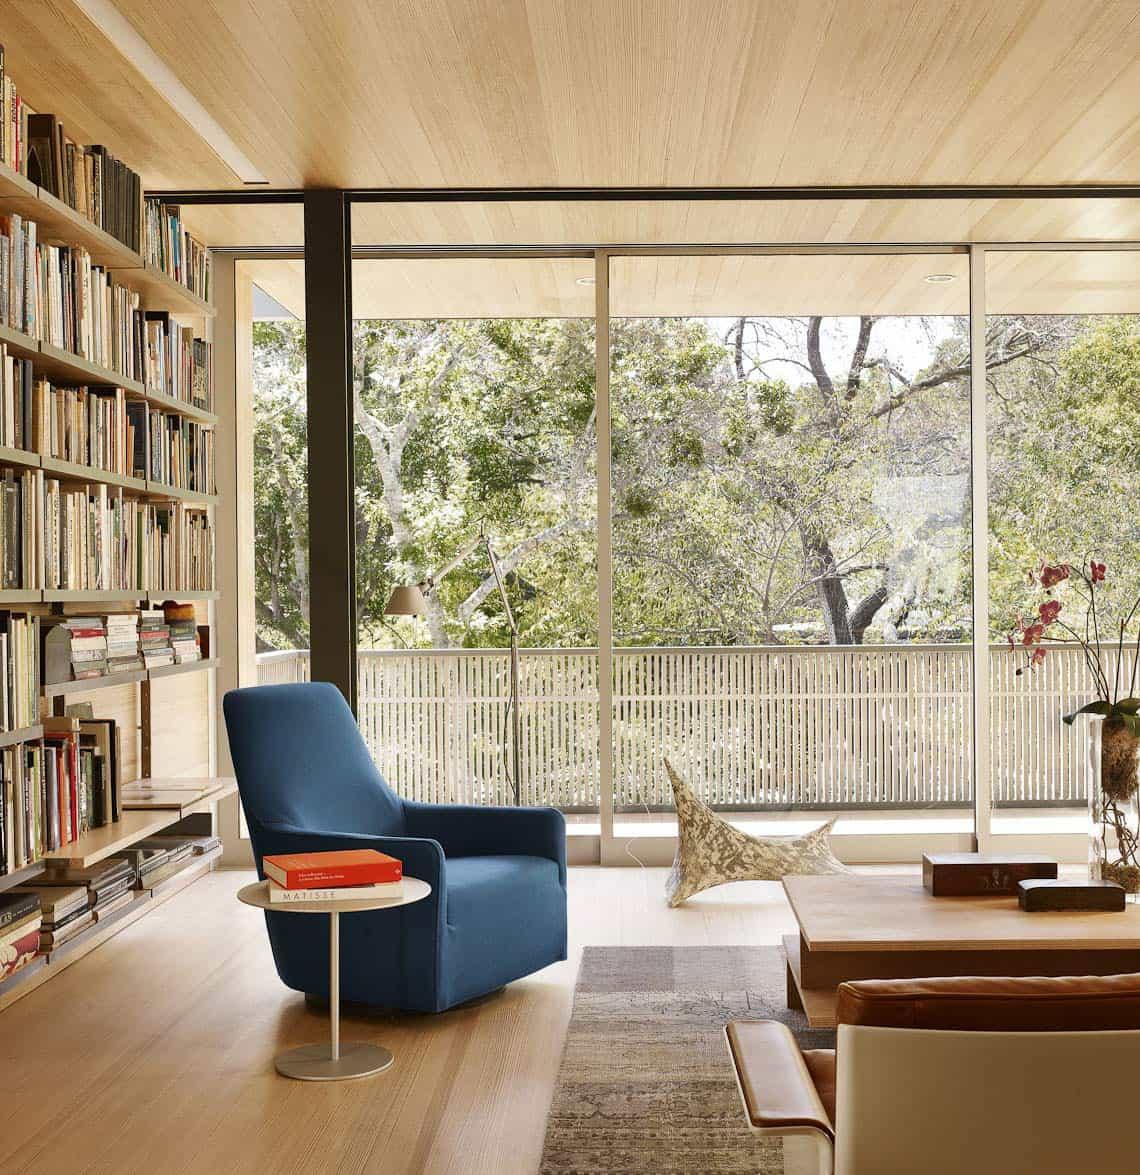 Balcones House by Pollen Architecture & Design